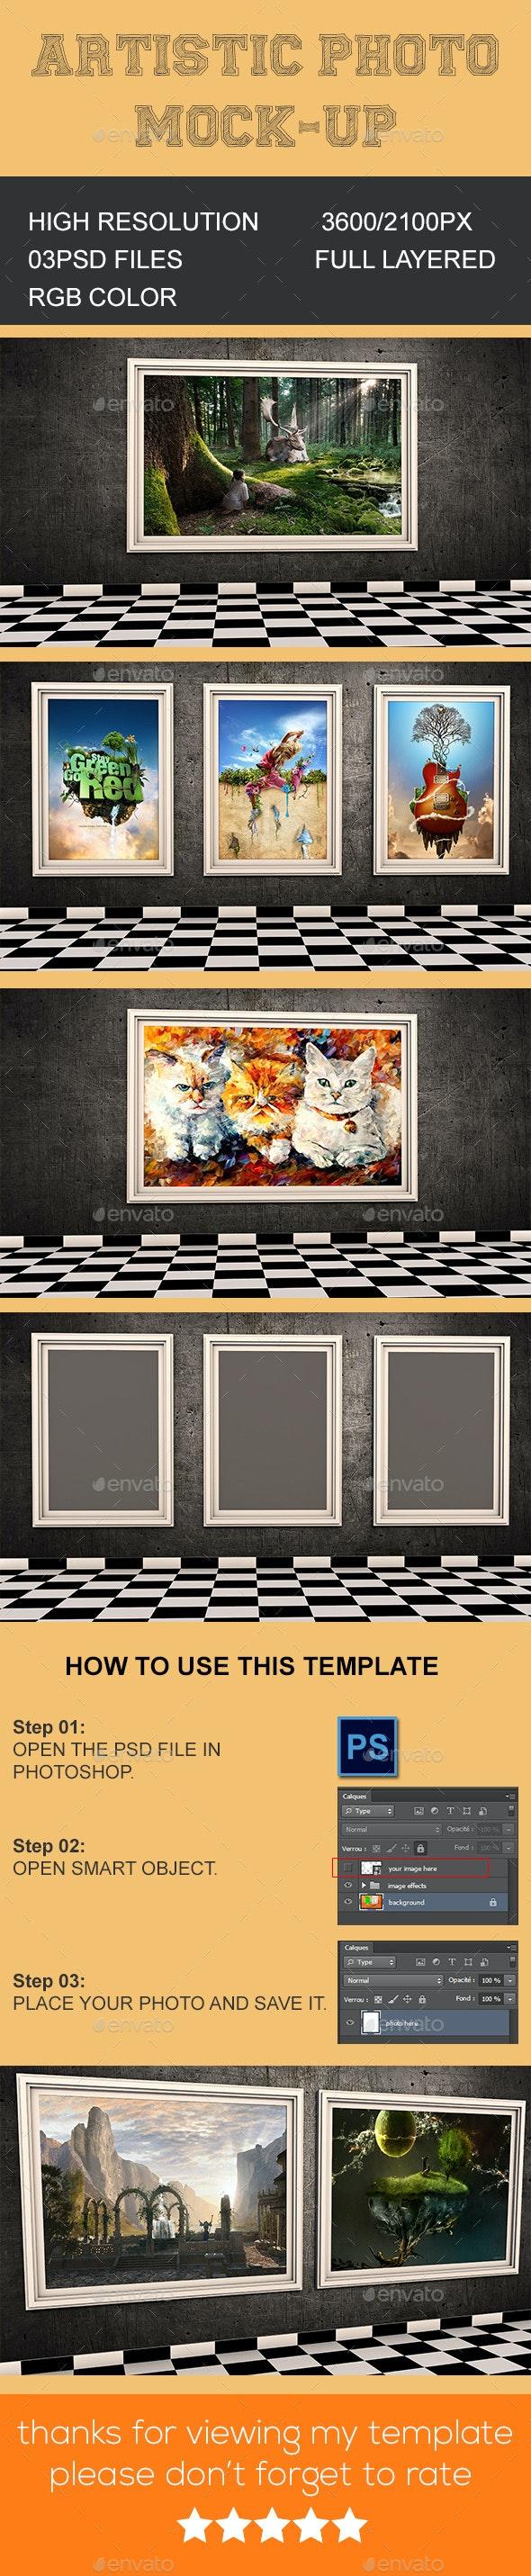 Artistic Photo Mock-up - Artistic Photo Templates